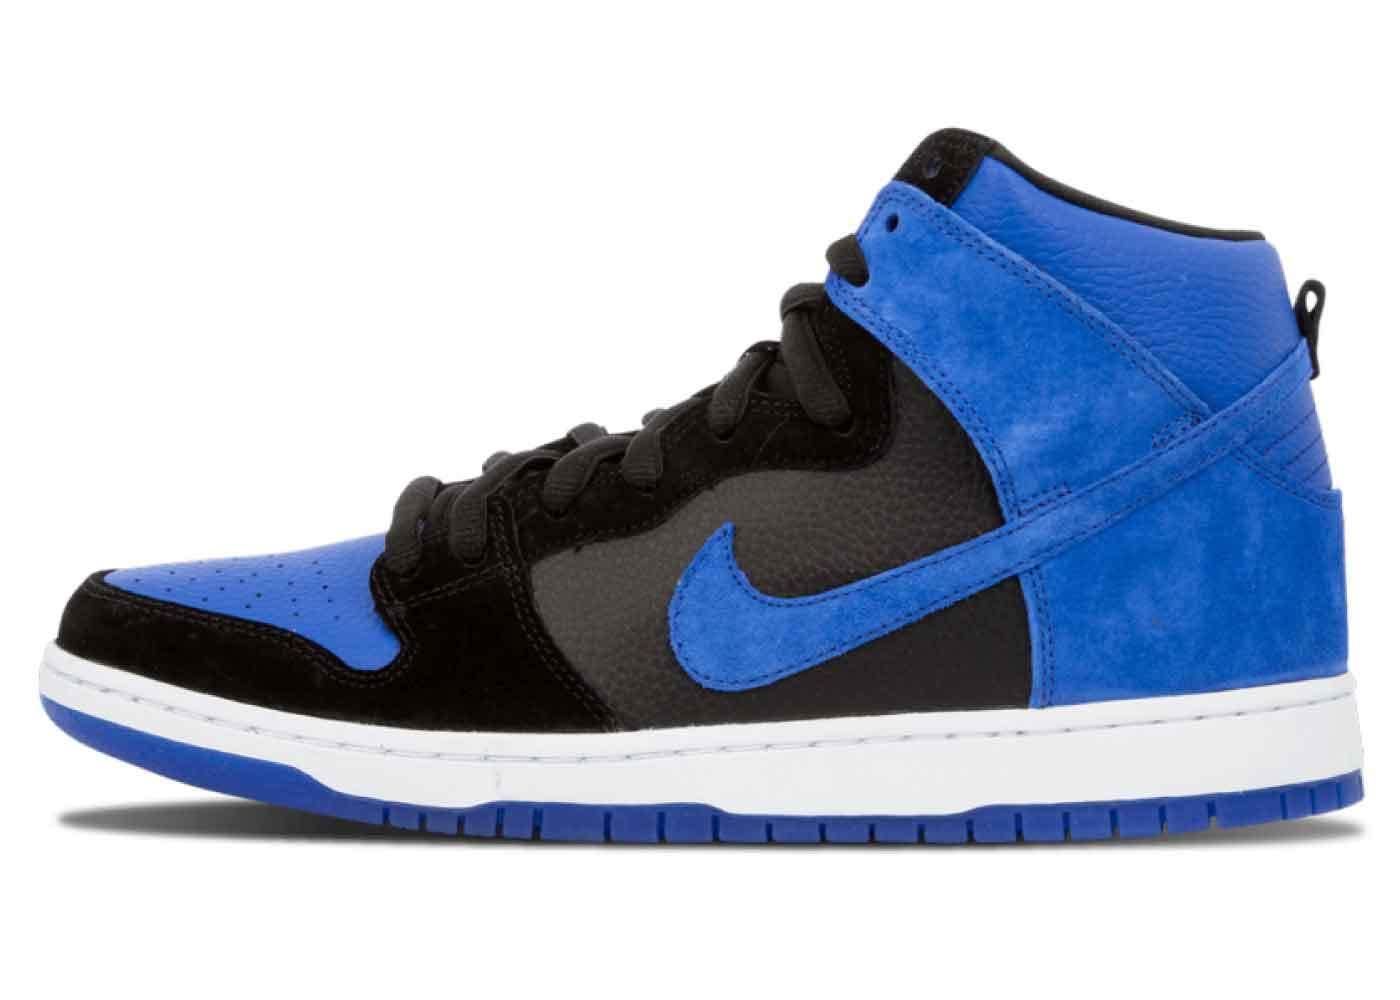 Nike SB Dunk High J Pack Royalの写真